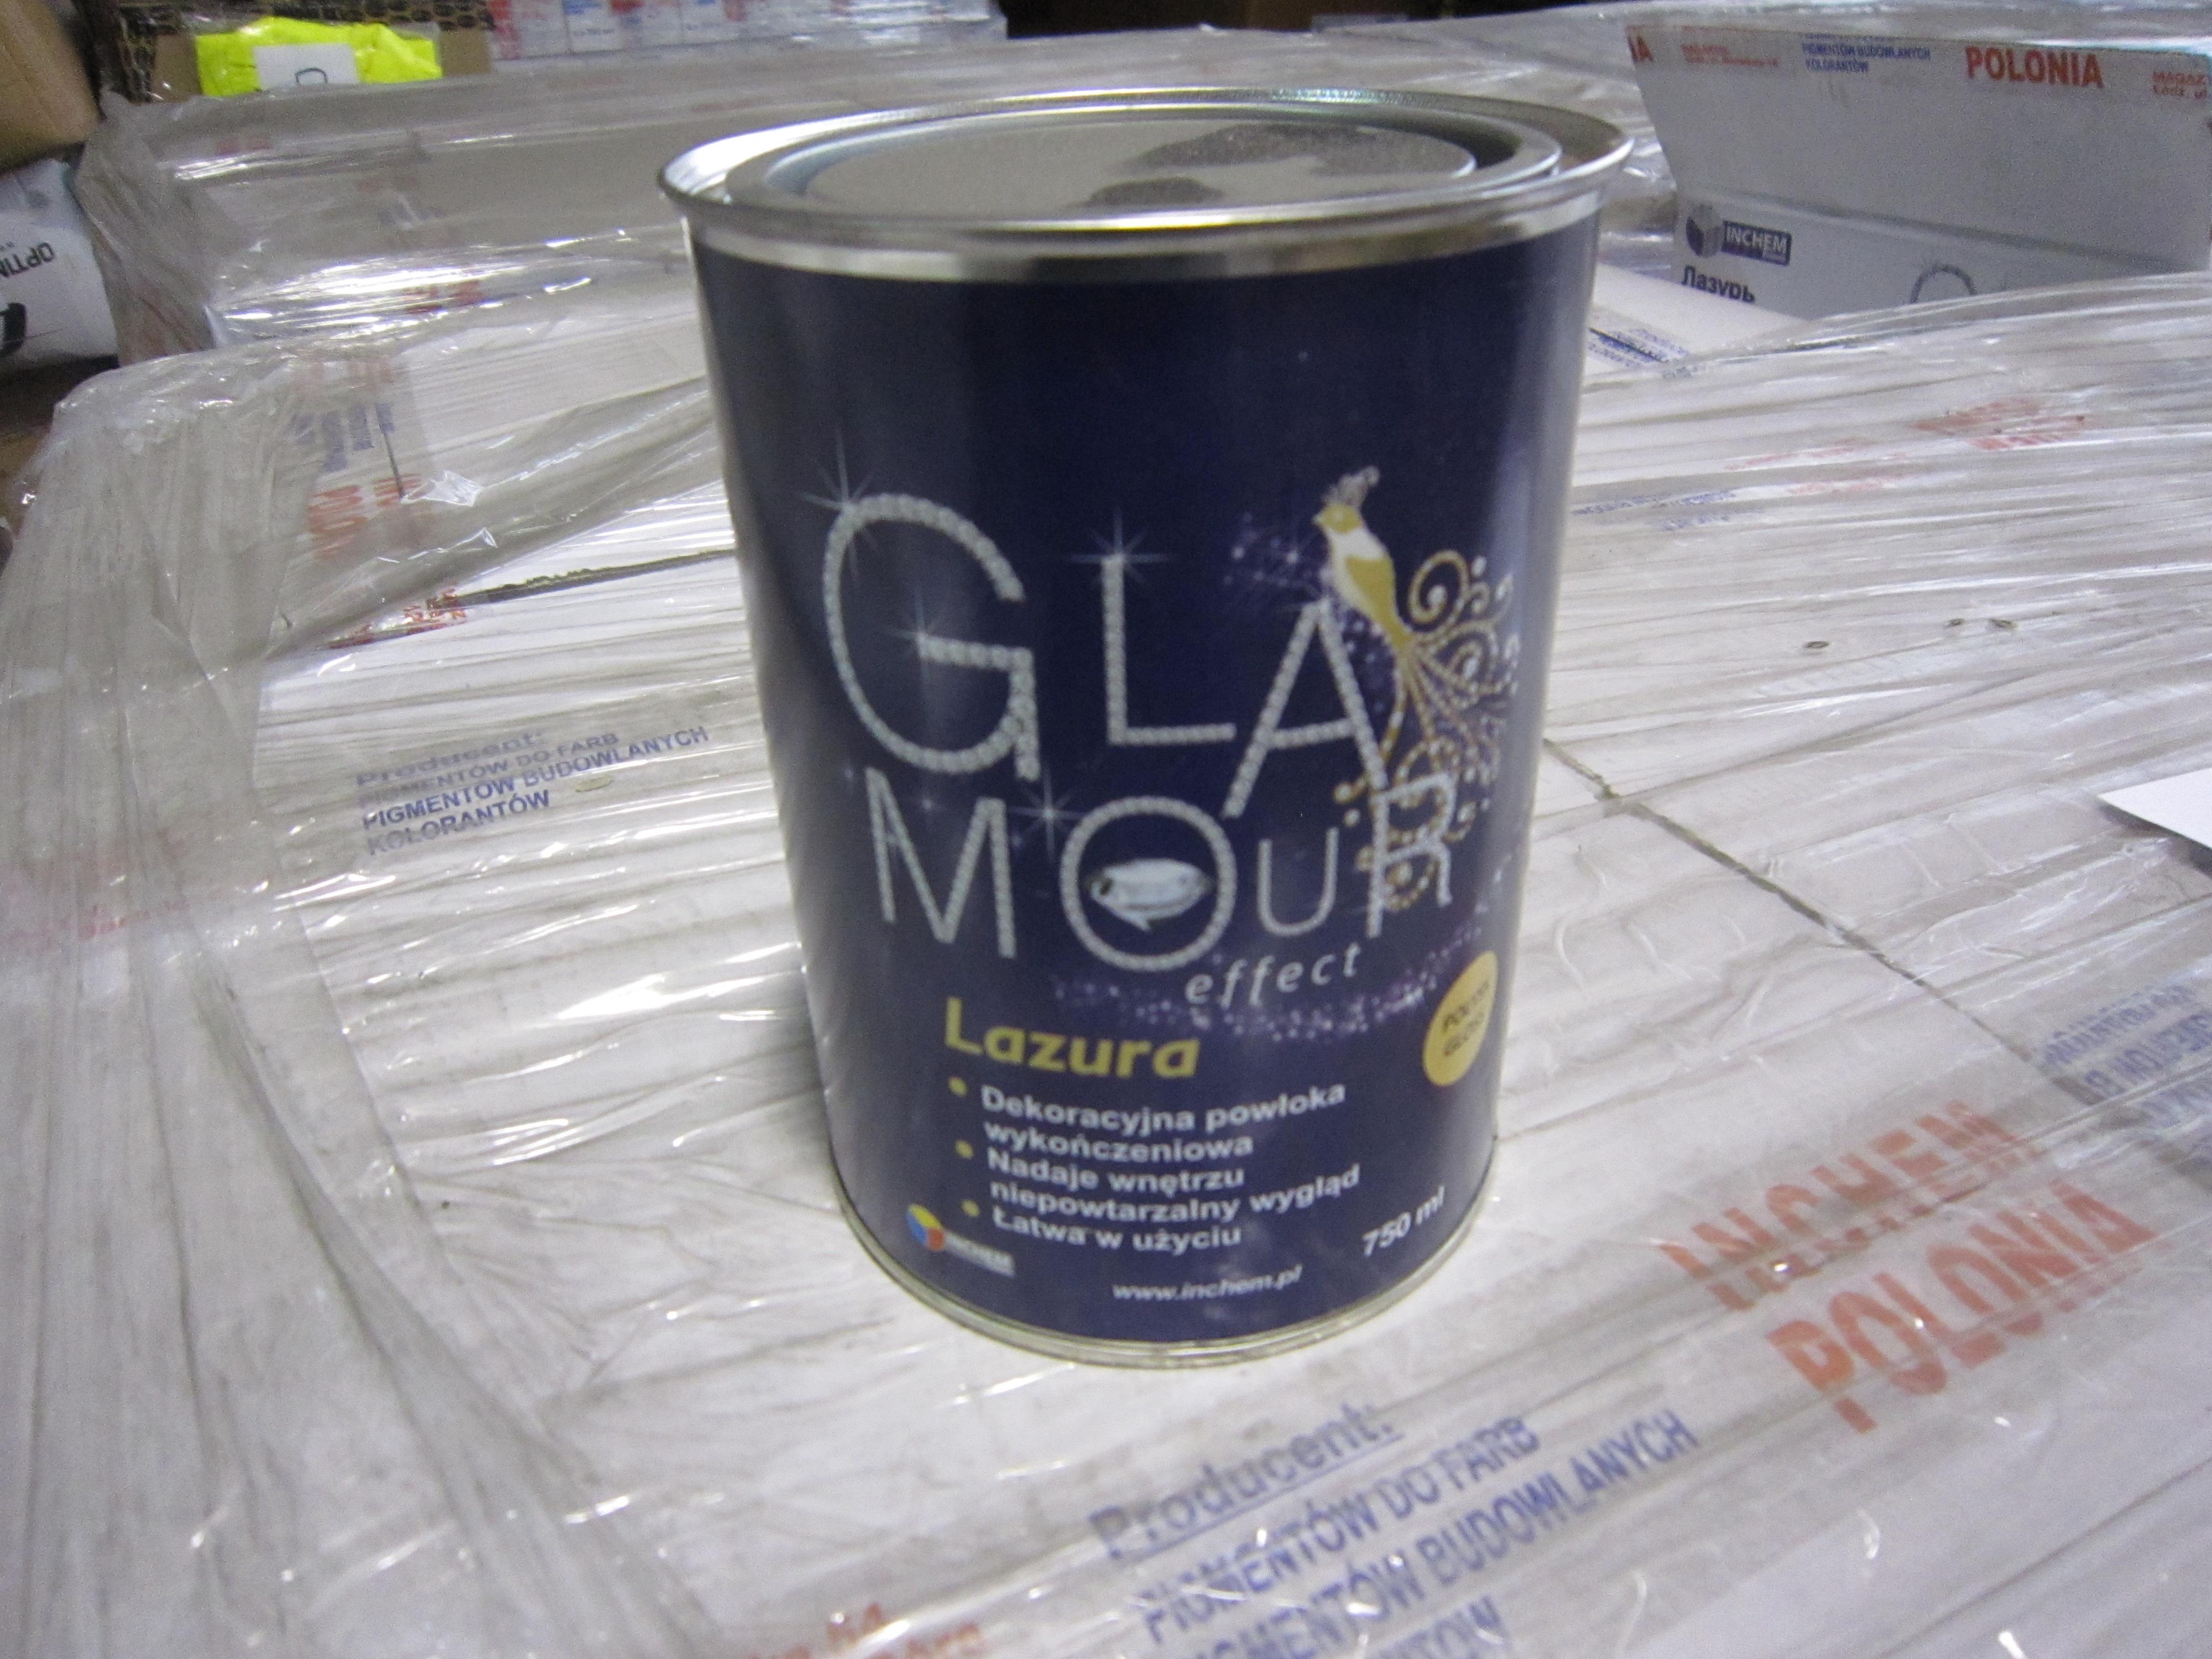 432 x Tins Glamour Effect Varnish Gloss Finish | RRP £7,750 - Image 2 of 4